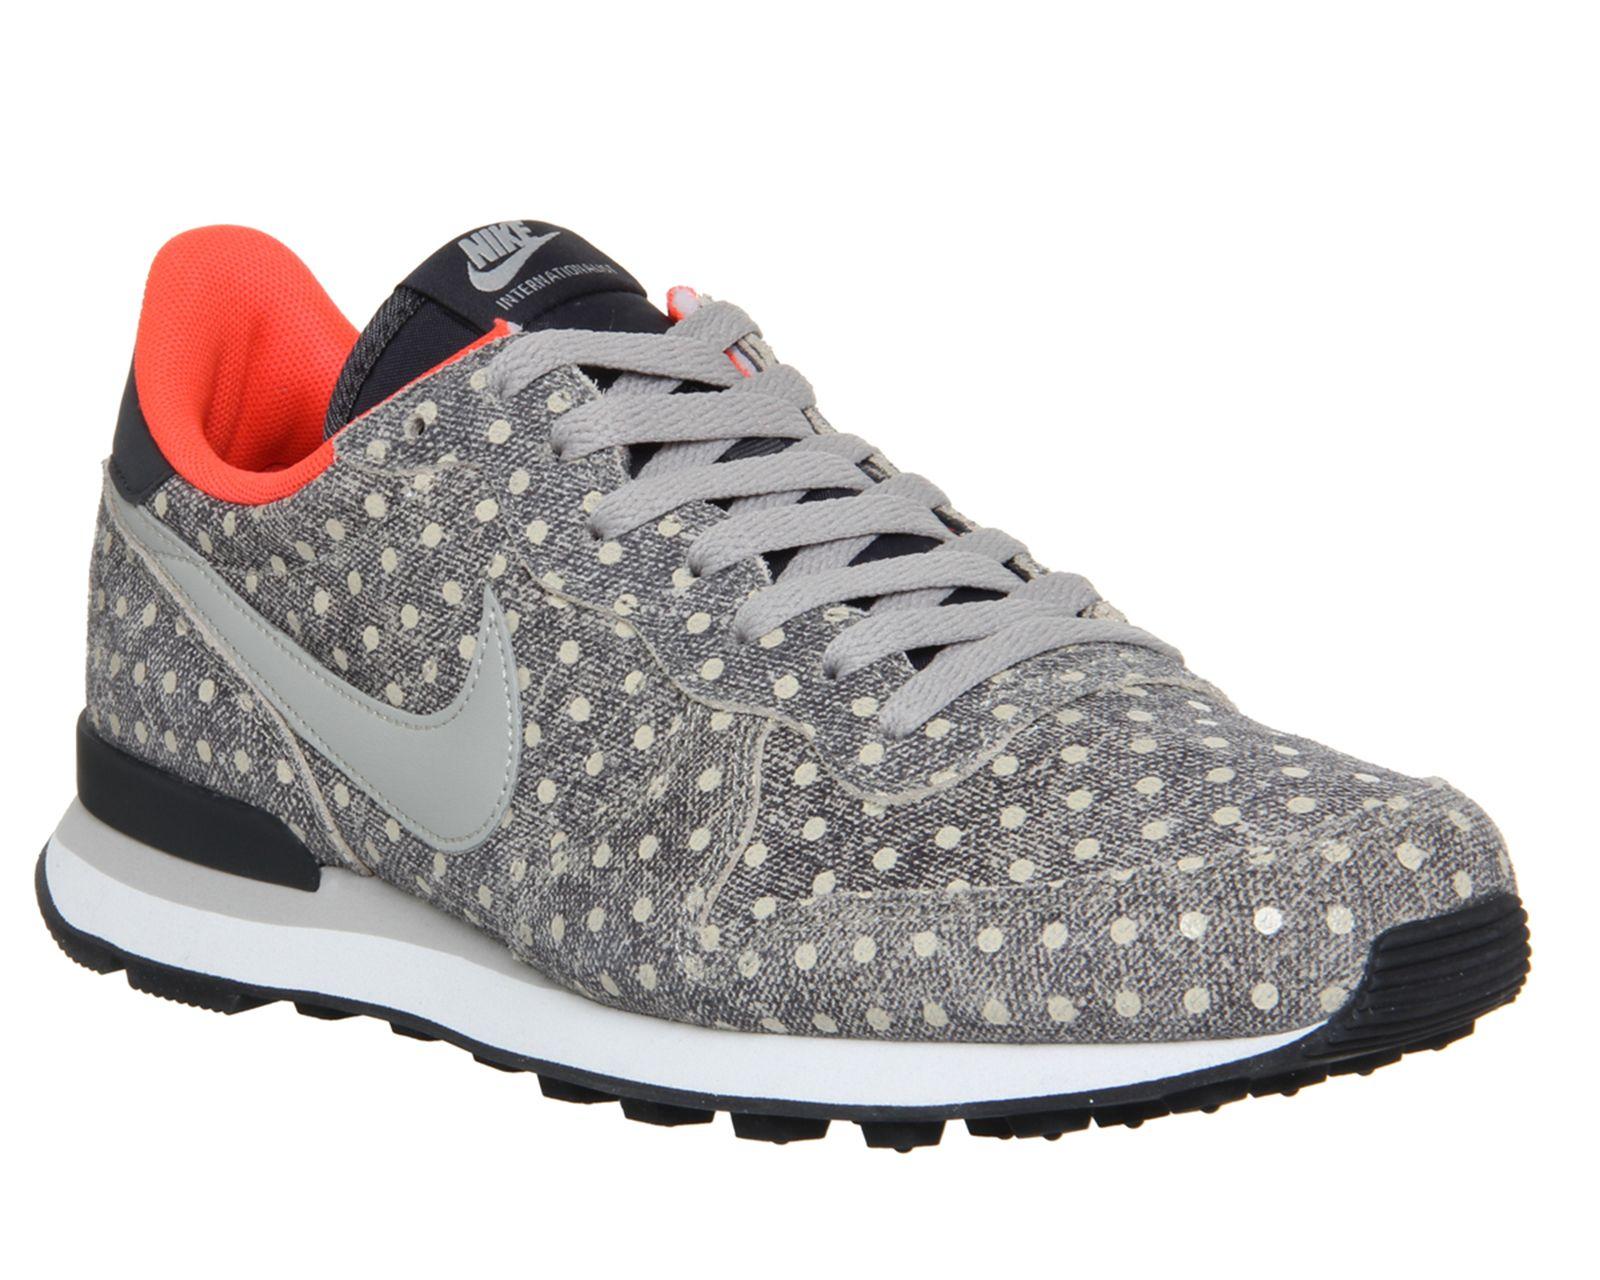 design de qualité 8f2c7 8d554 Nike Nike Internationalist Chambray Polka Infra Prm - For ...